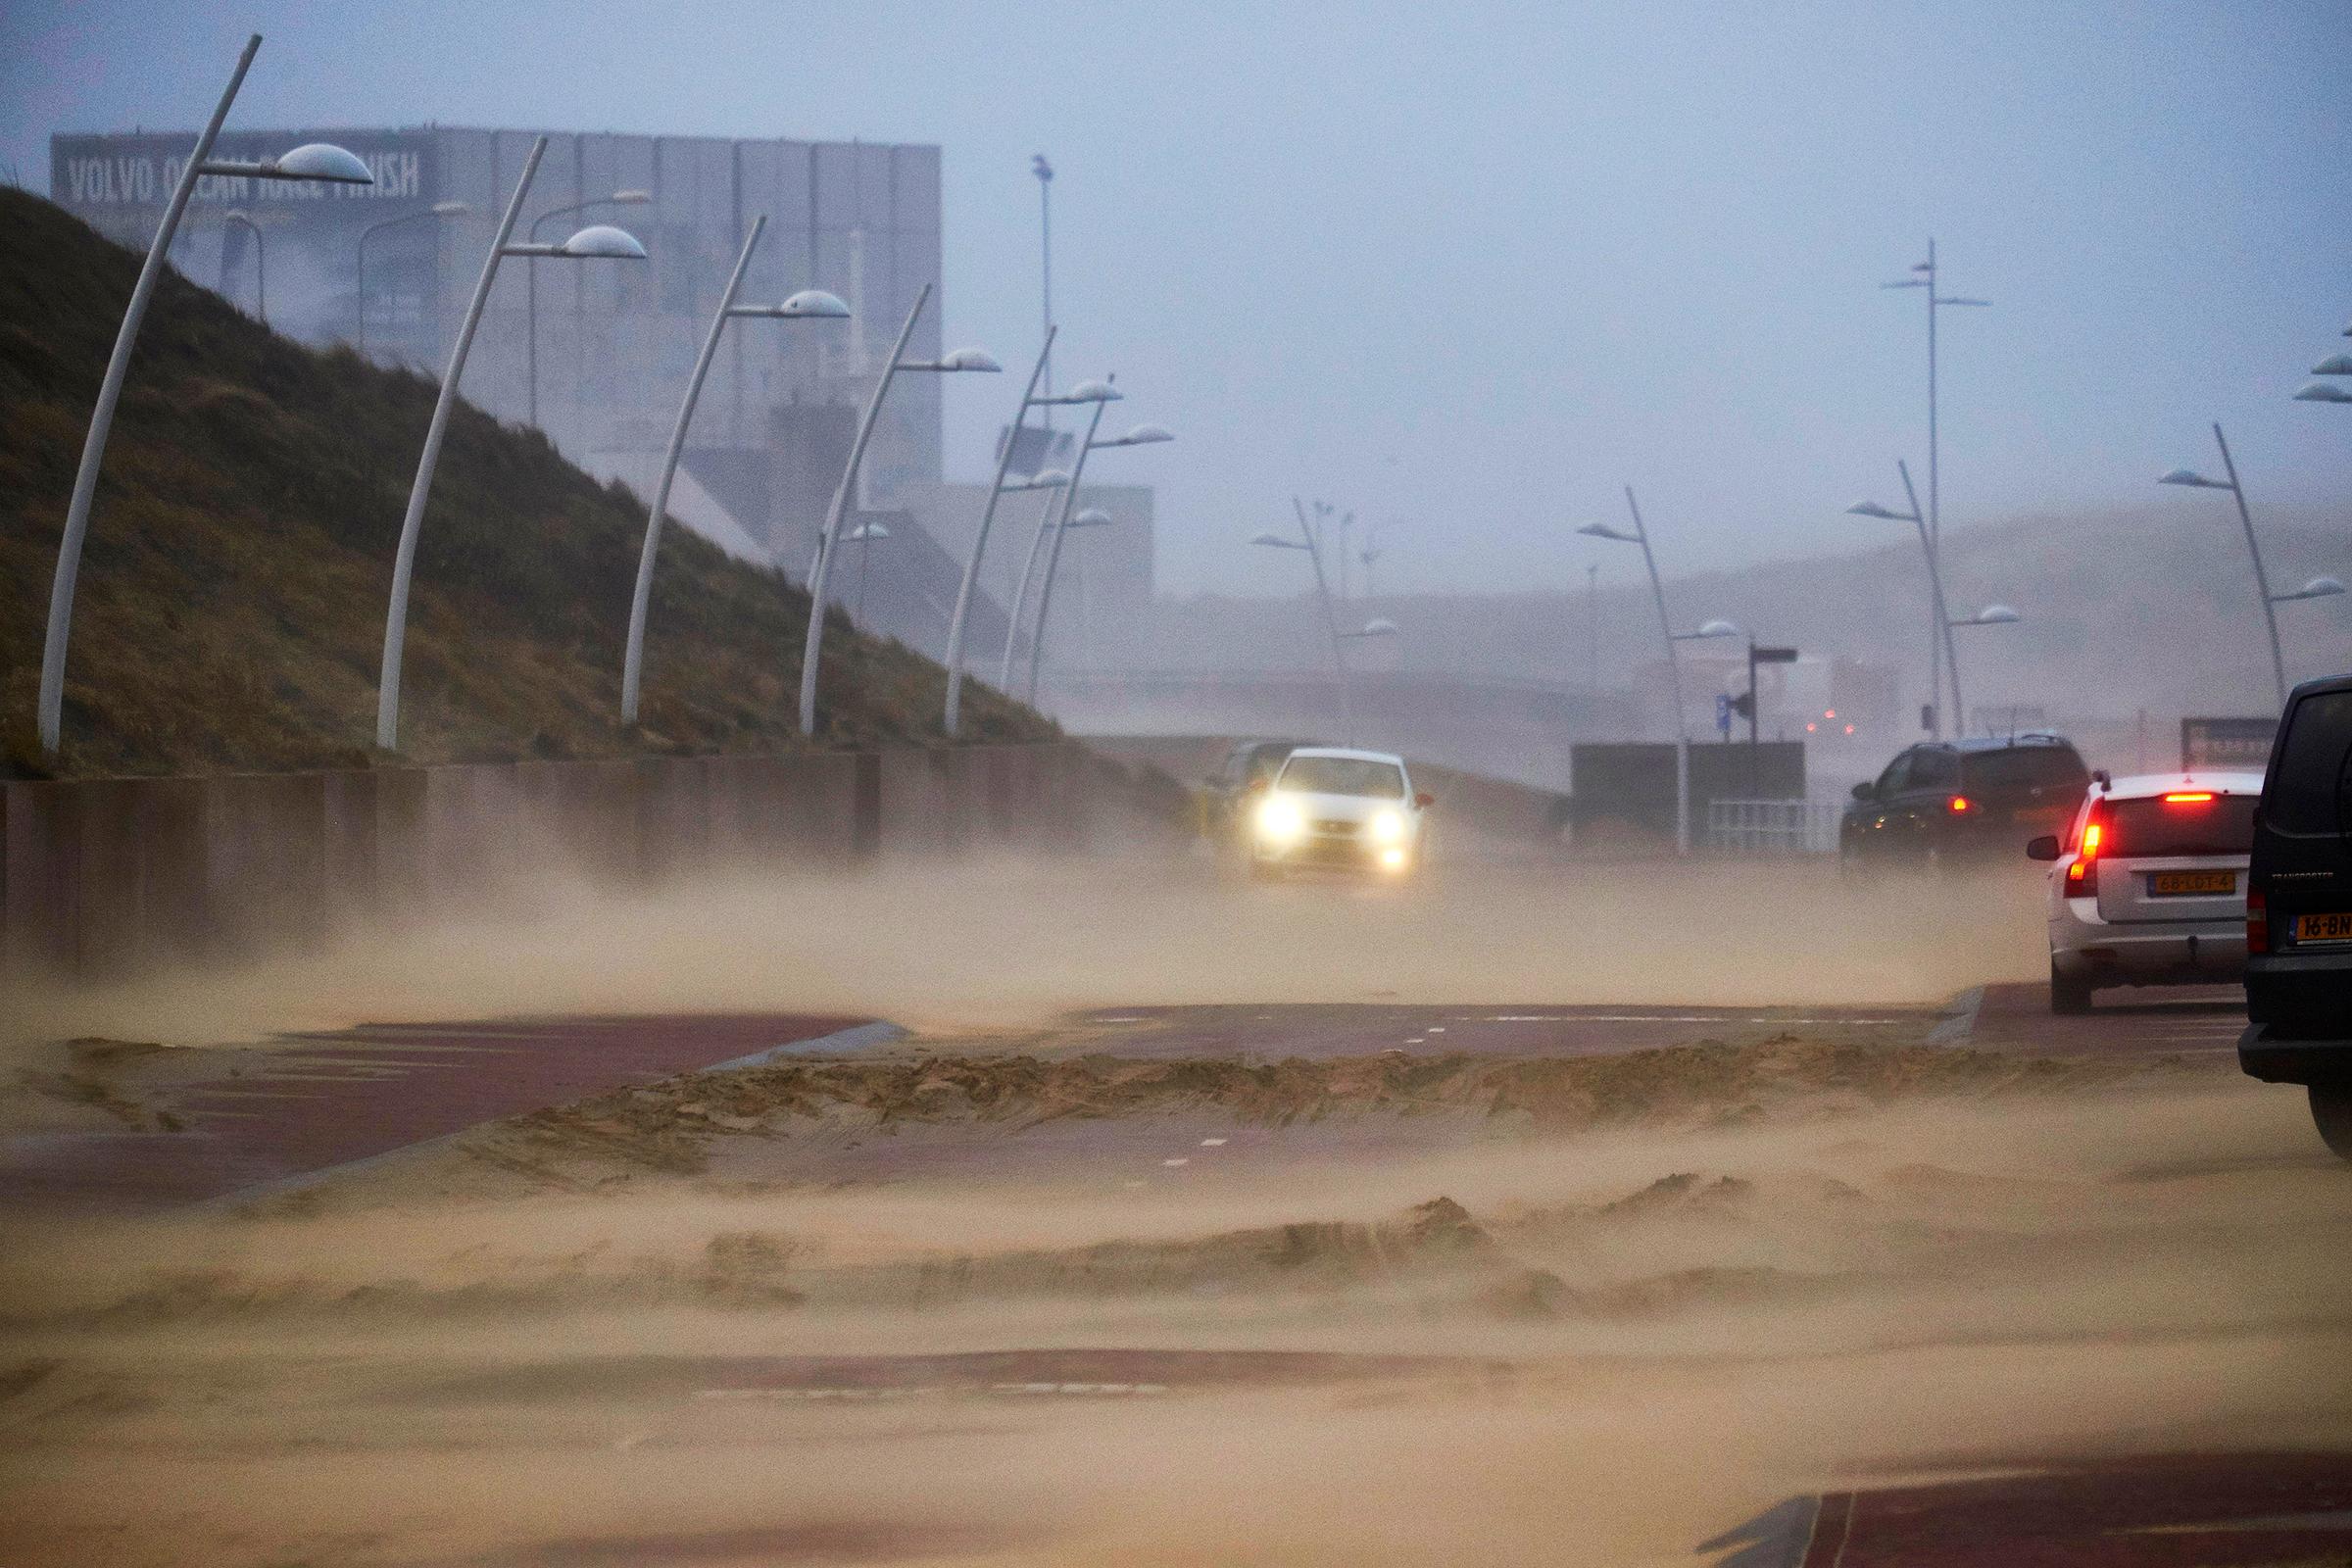 Последствия шторма «Фредерике» в Европе. Фоторепортаж